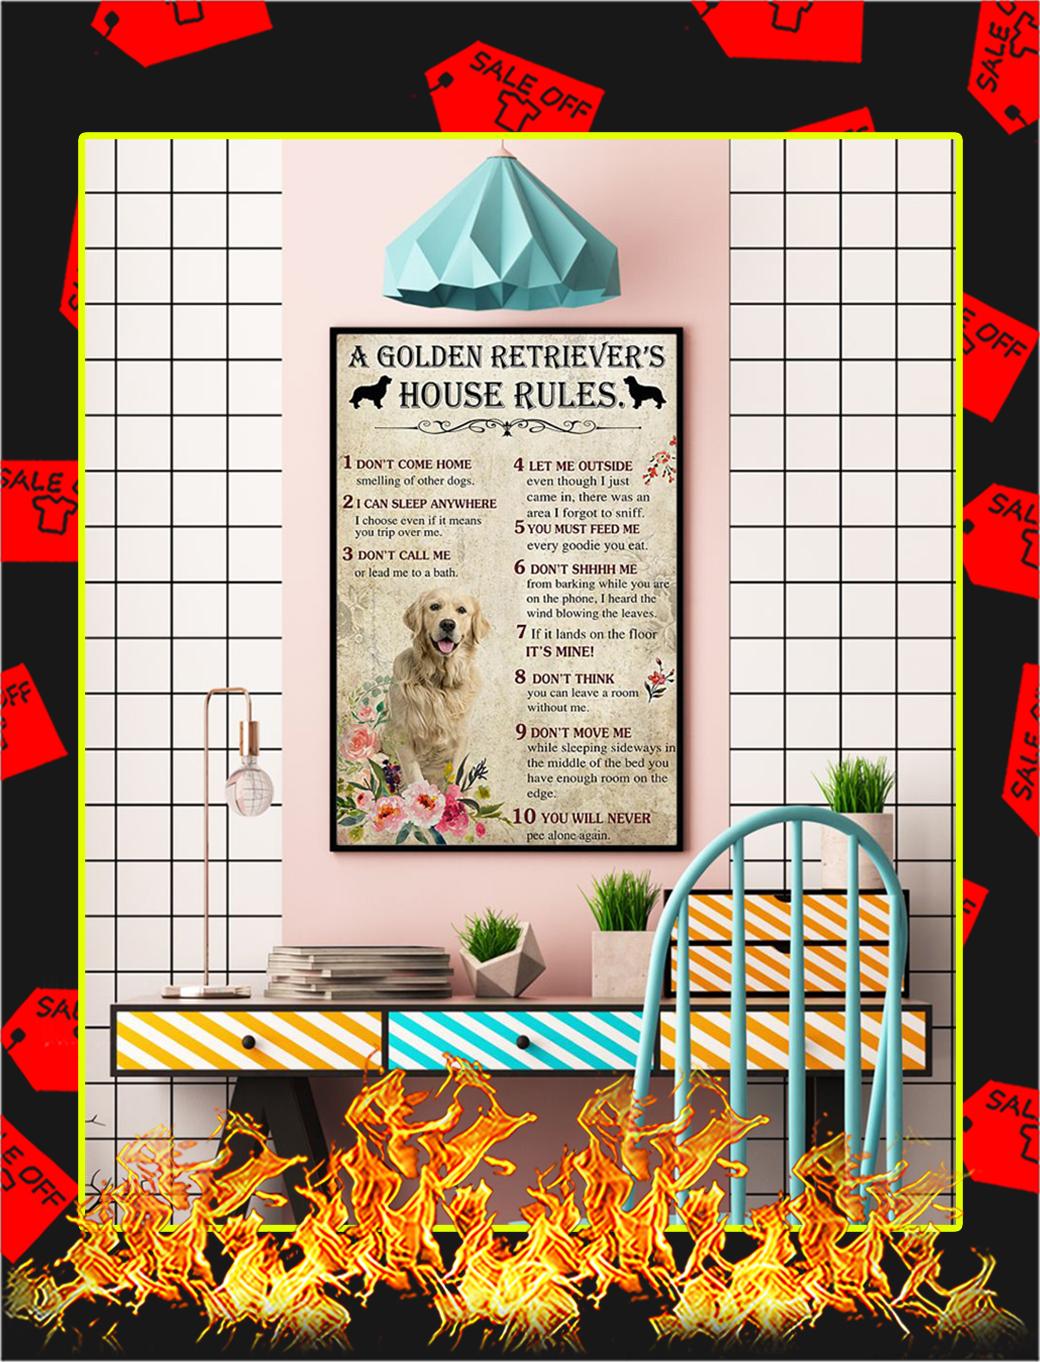 A Golden Retriever House Rules Poster- A2